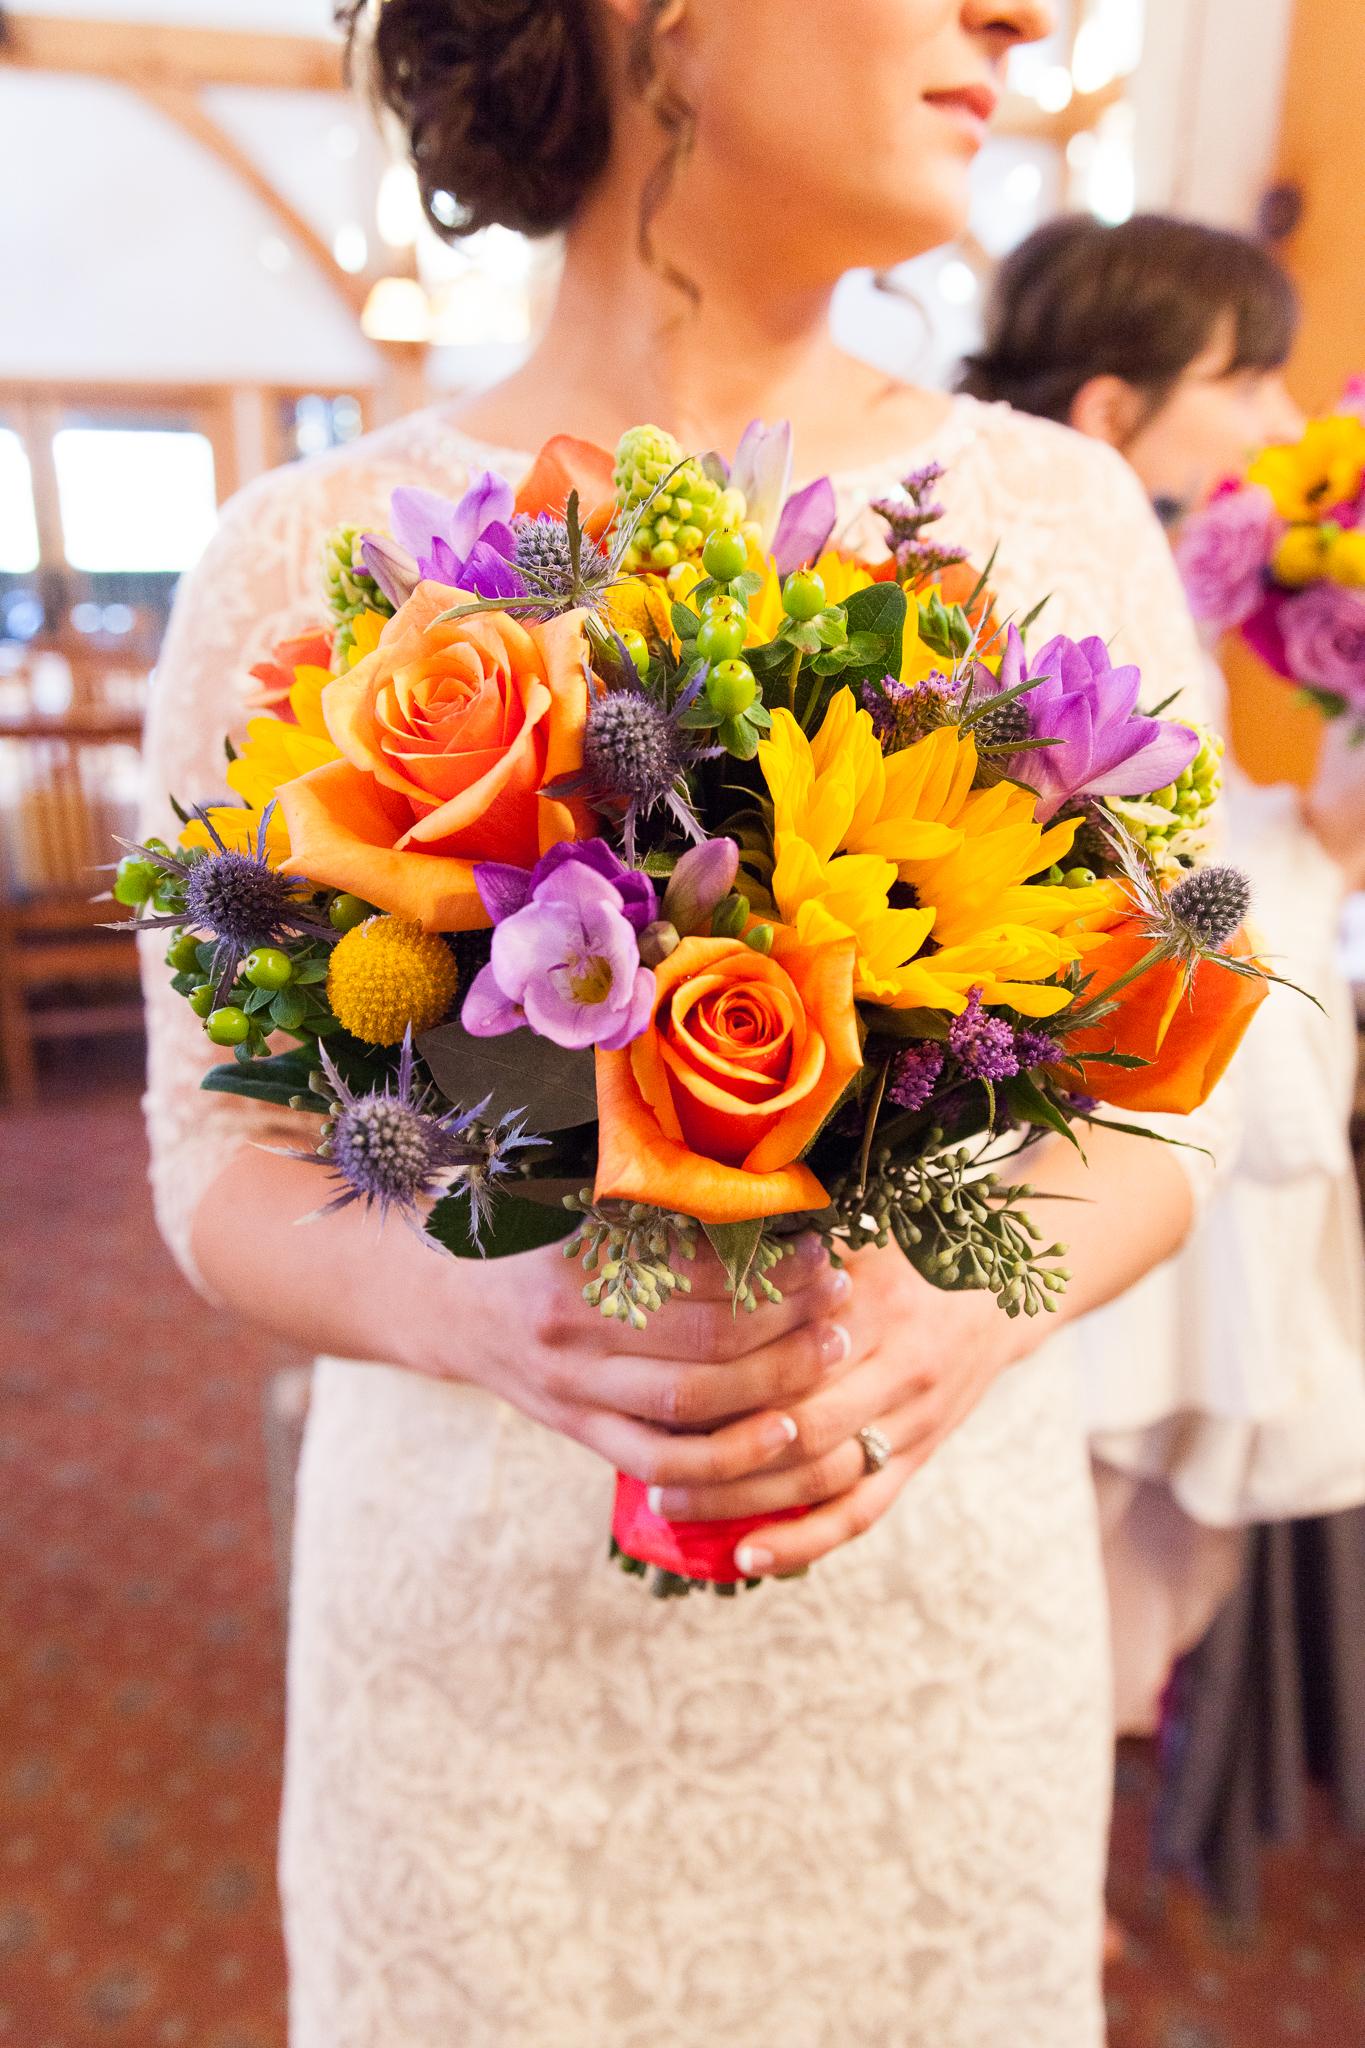 camuglia-whomstudio-chelsea_and_andy-nycphotographer-wedding-brooklyn-buffalo-timberlodge-017-0071.jpg